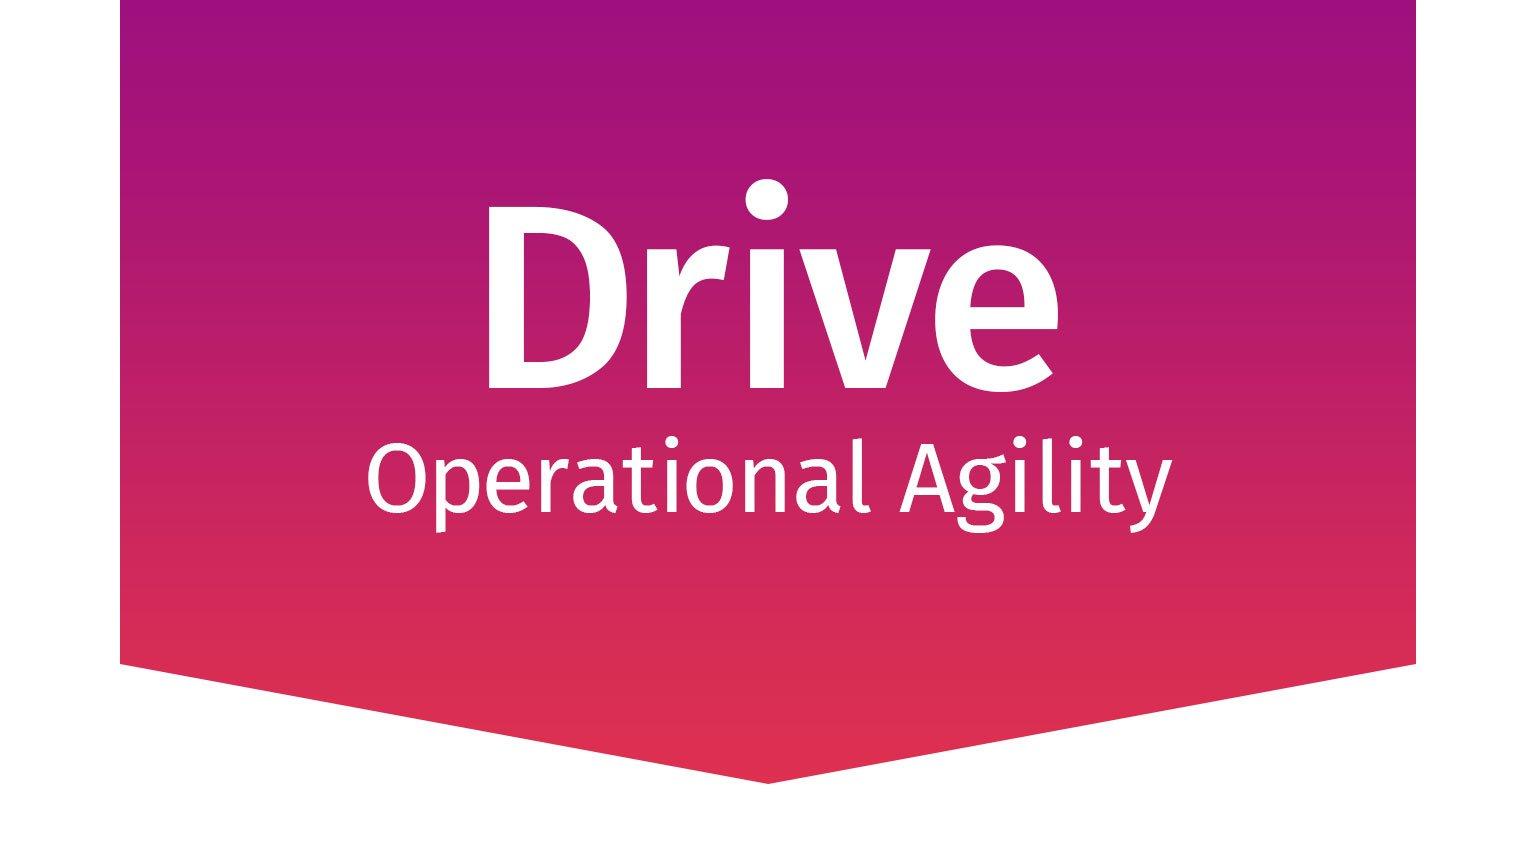 Drive Operational Agility